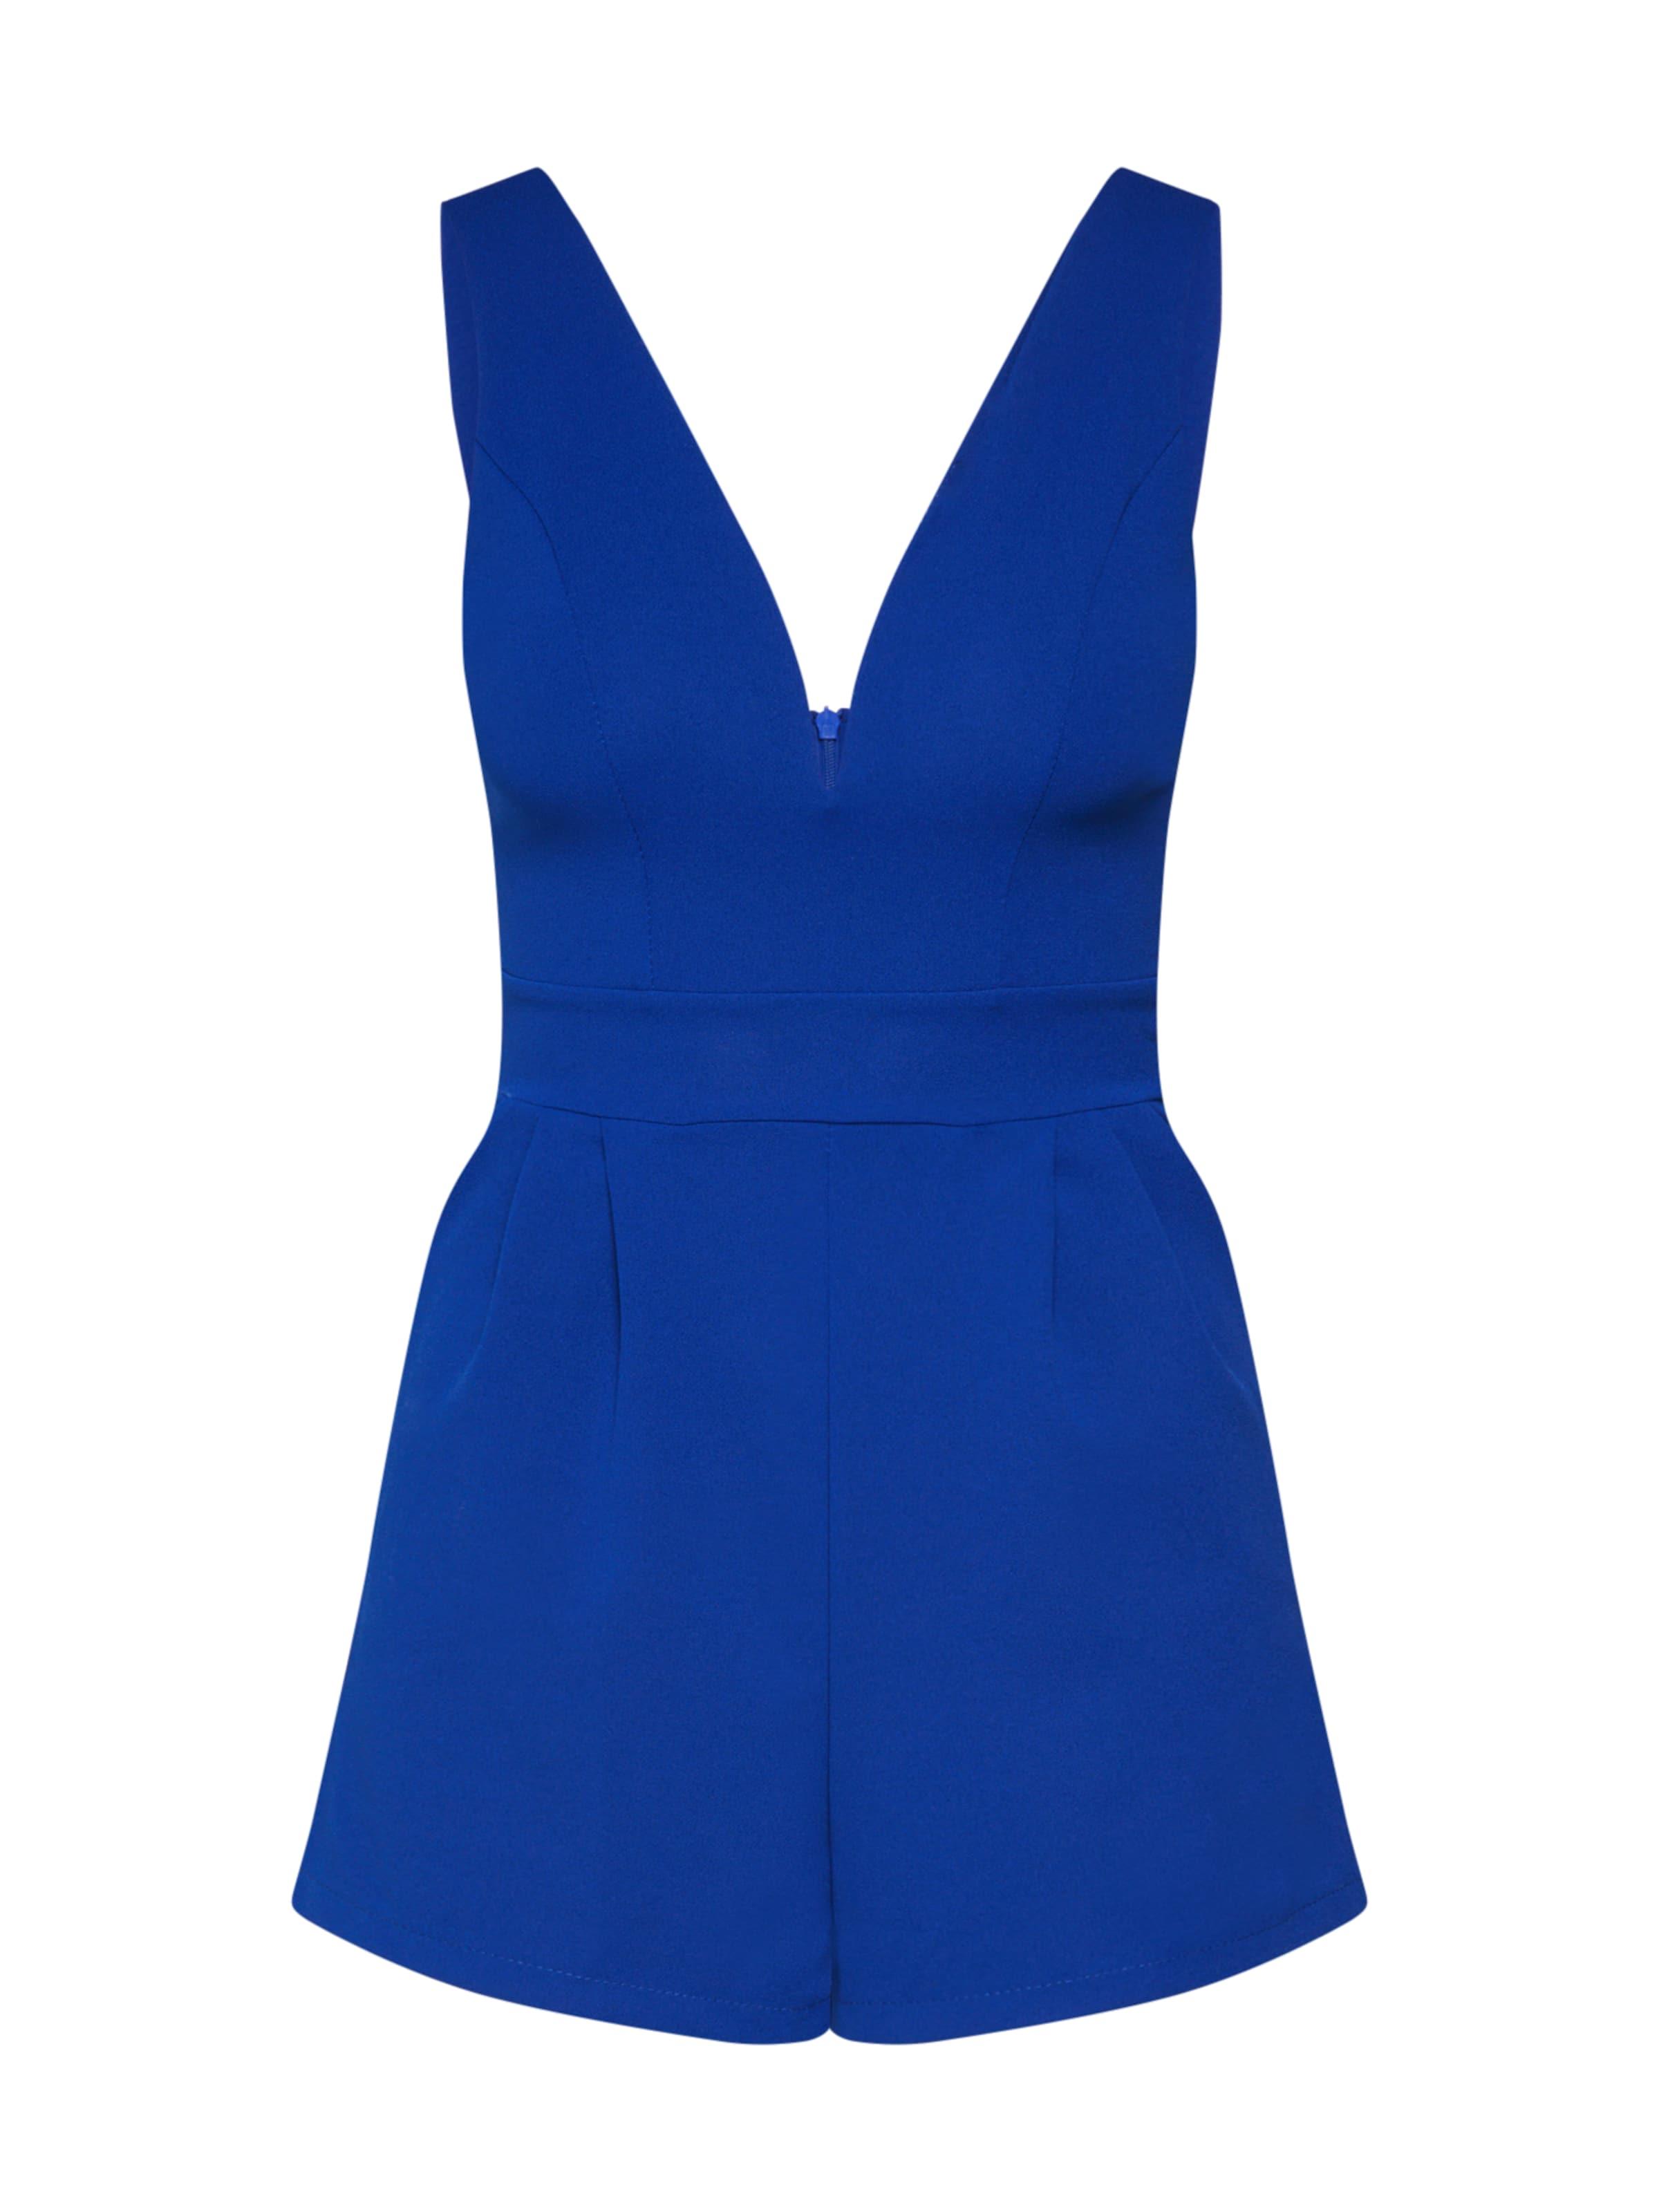 Bleu Cobalt GCombinaison En Wal Tl1cJ5FuK3